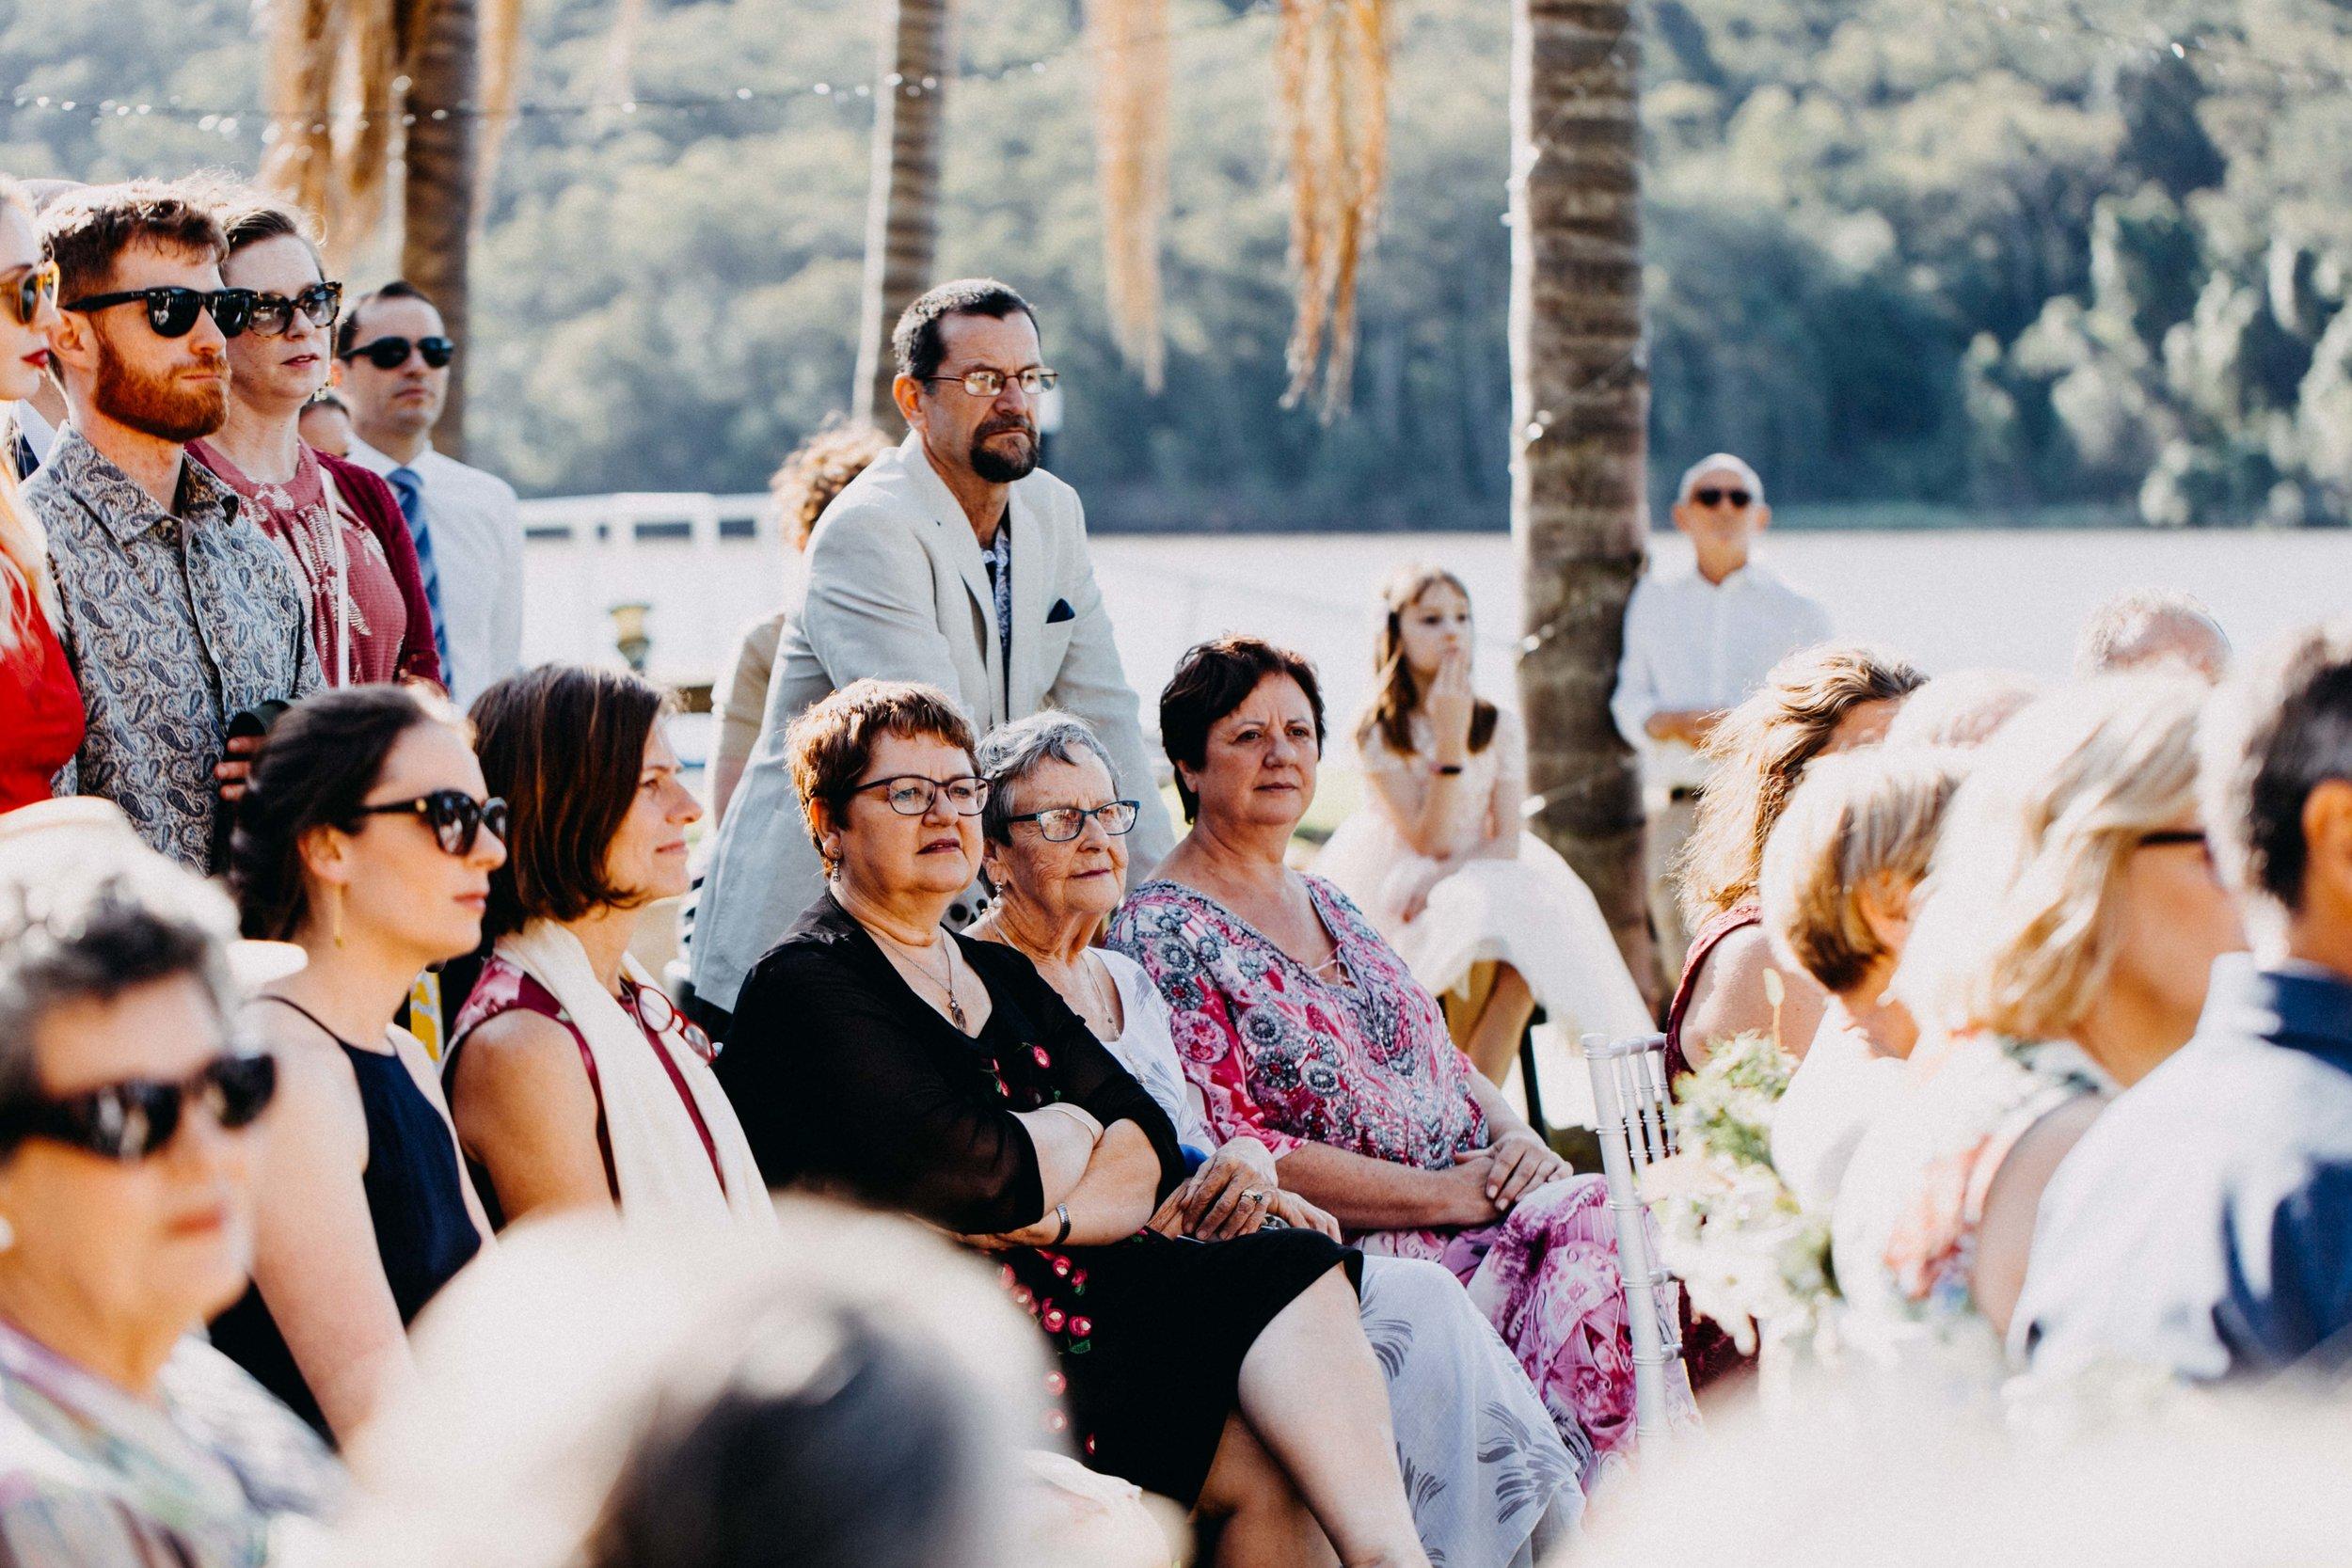 wisemans-ferry-wedding-www.emilyobrienphotography.net-58.jpg